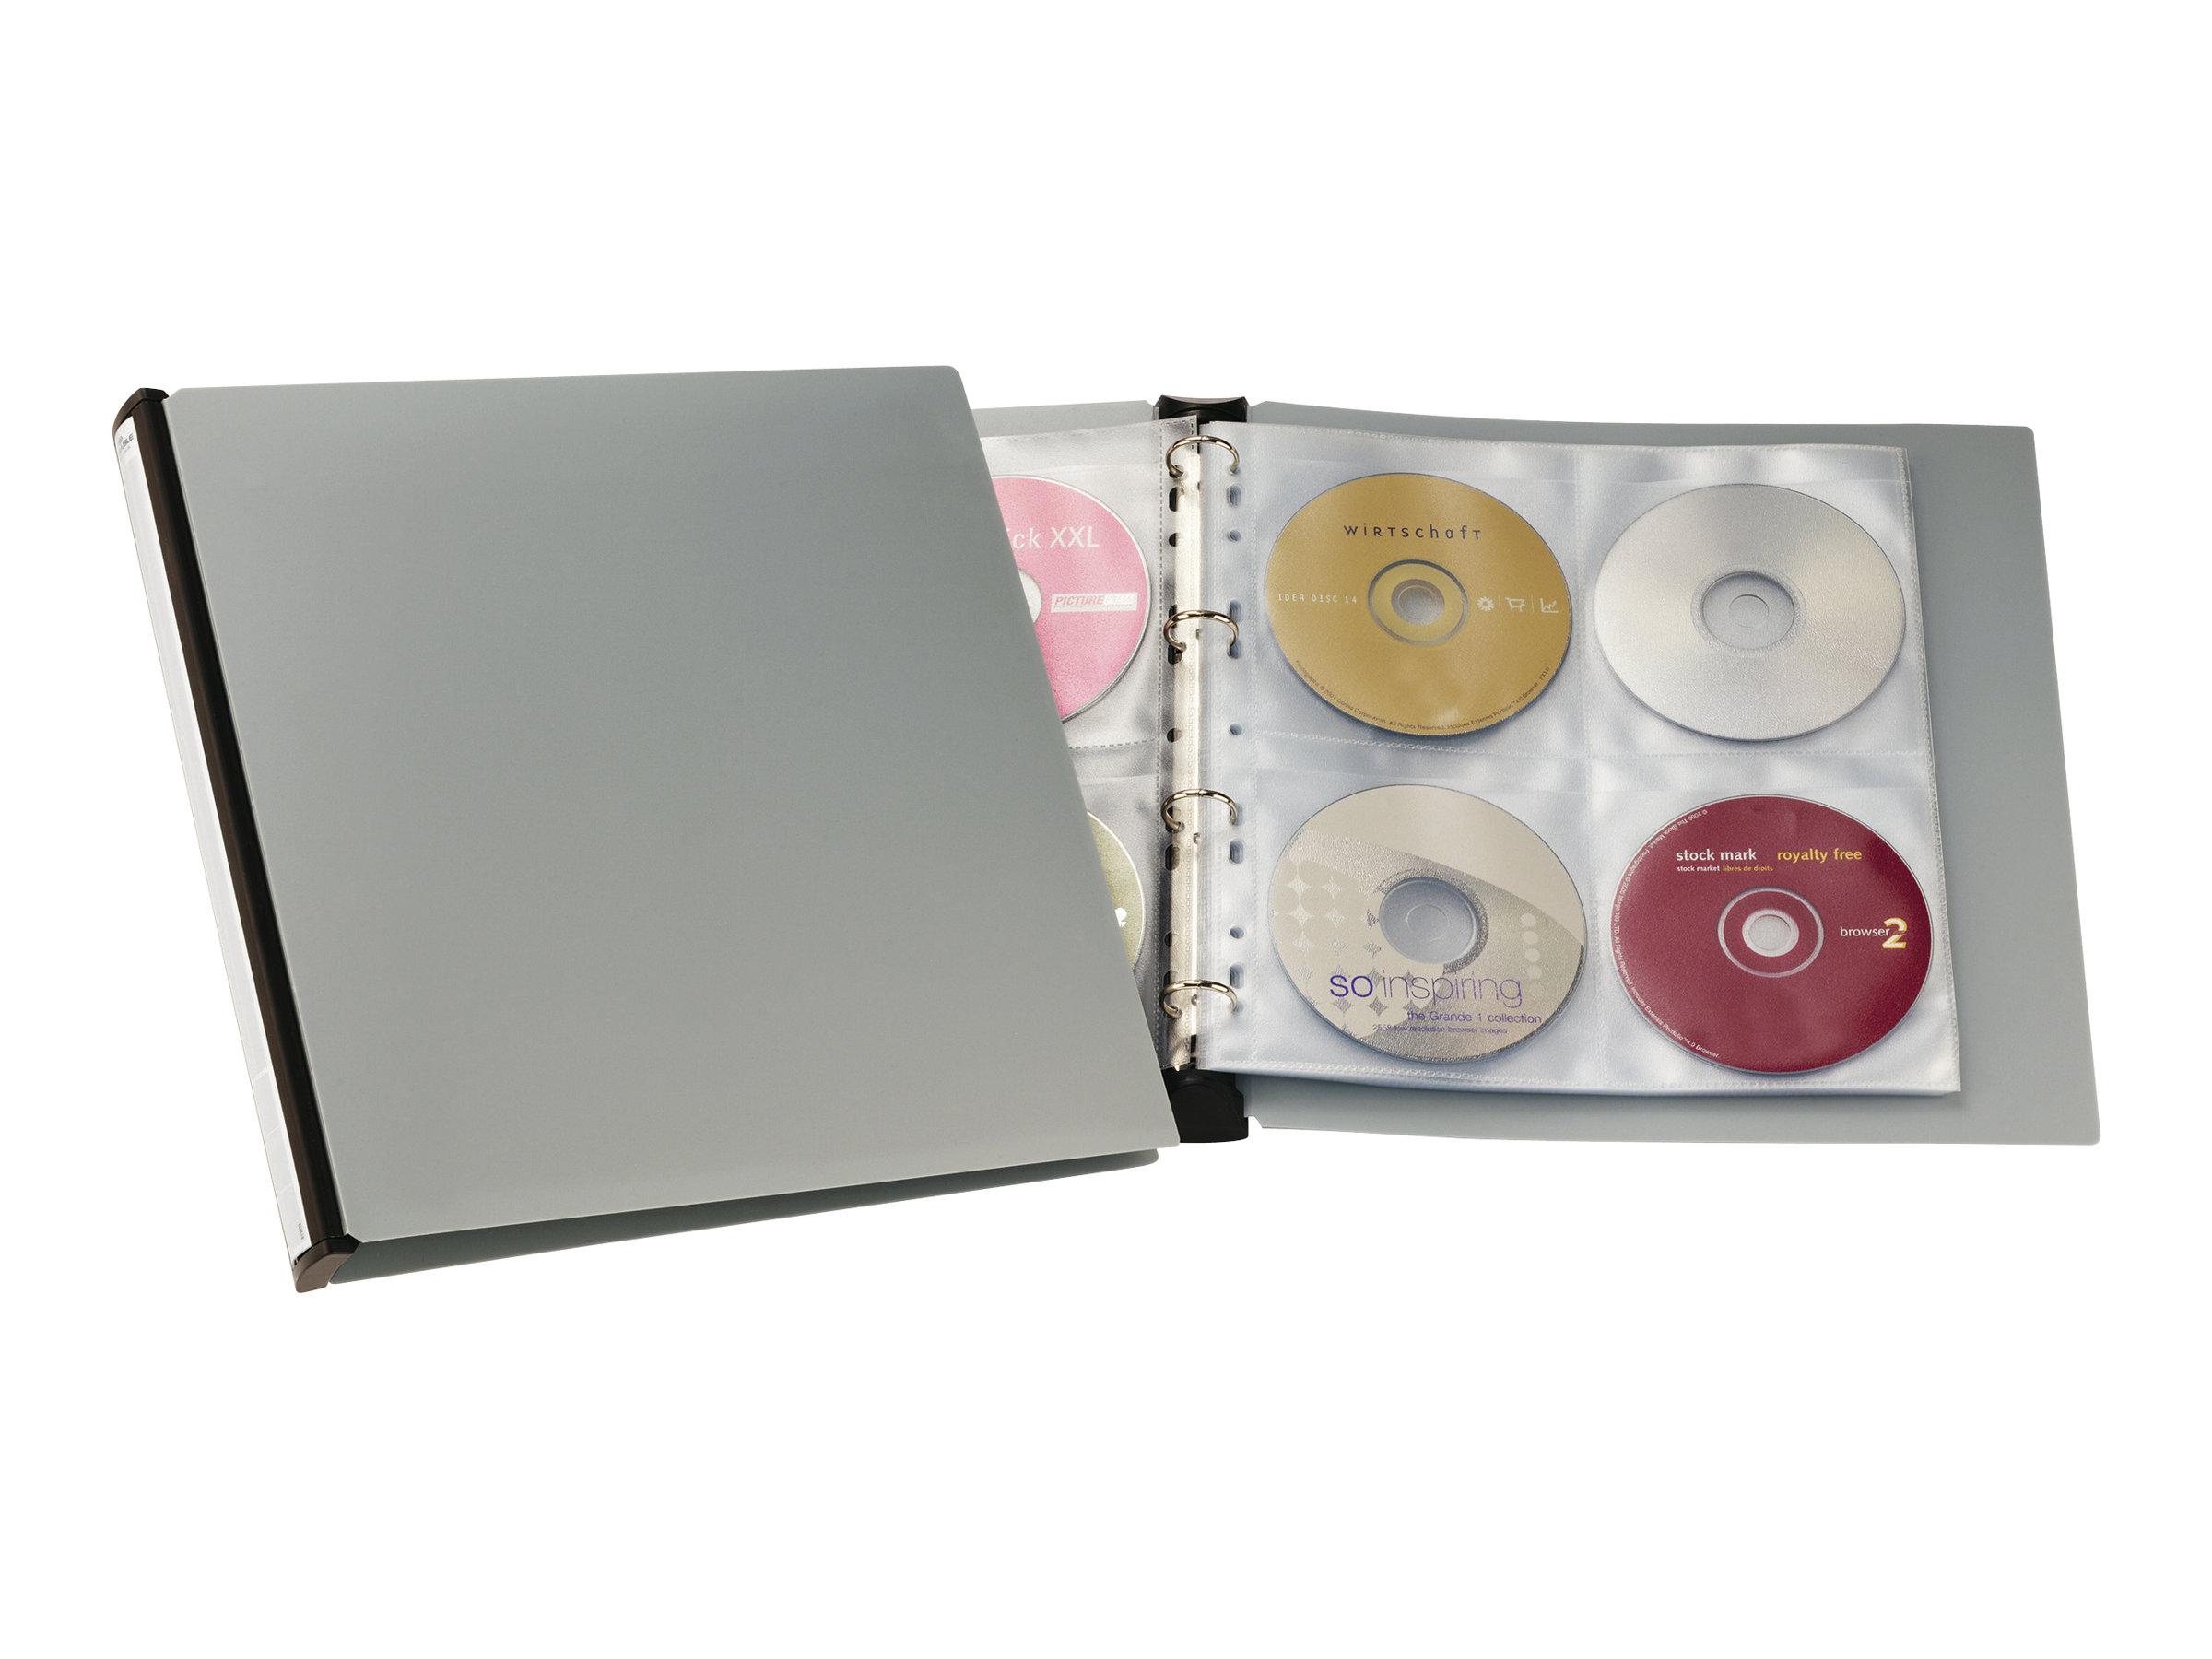 Durable CD/DVD Album 96 - CD/DVD-Ringhefter - Kapazität: 96 CD/DVD